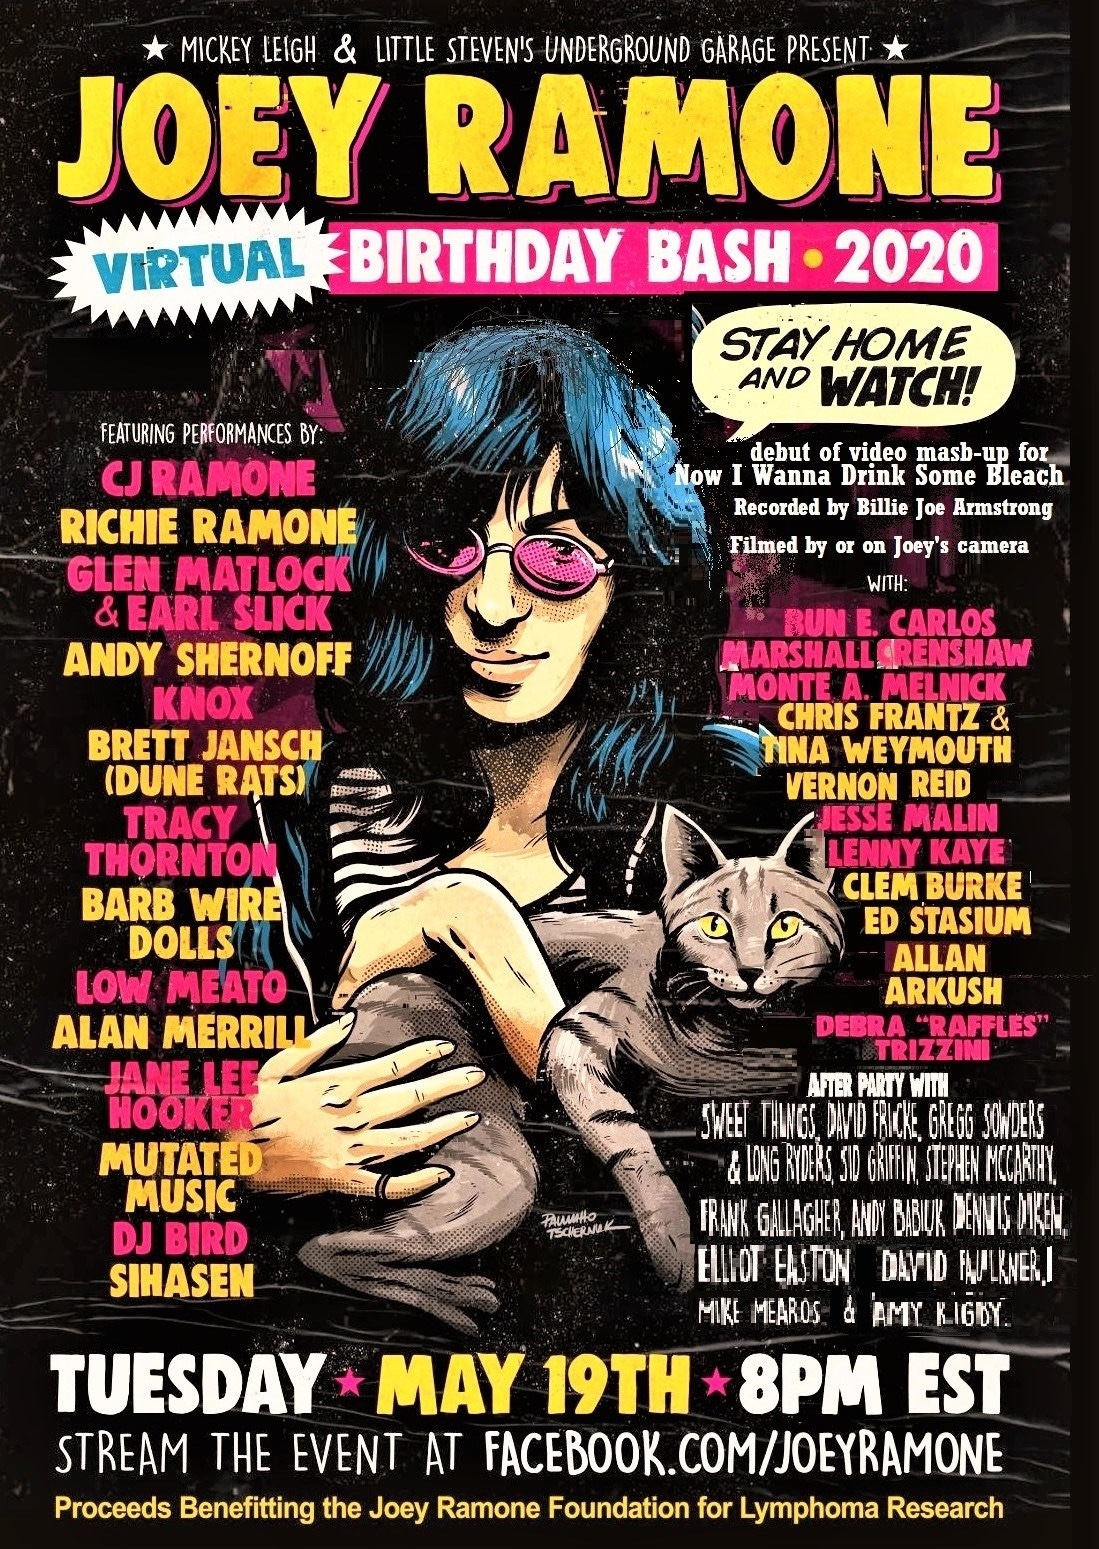 Joey Ramone Virtual Birthday Bash 2020